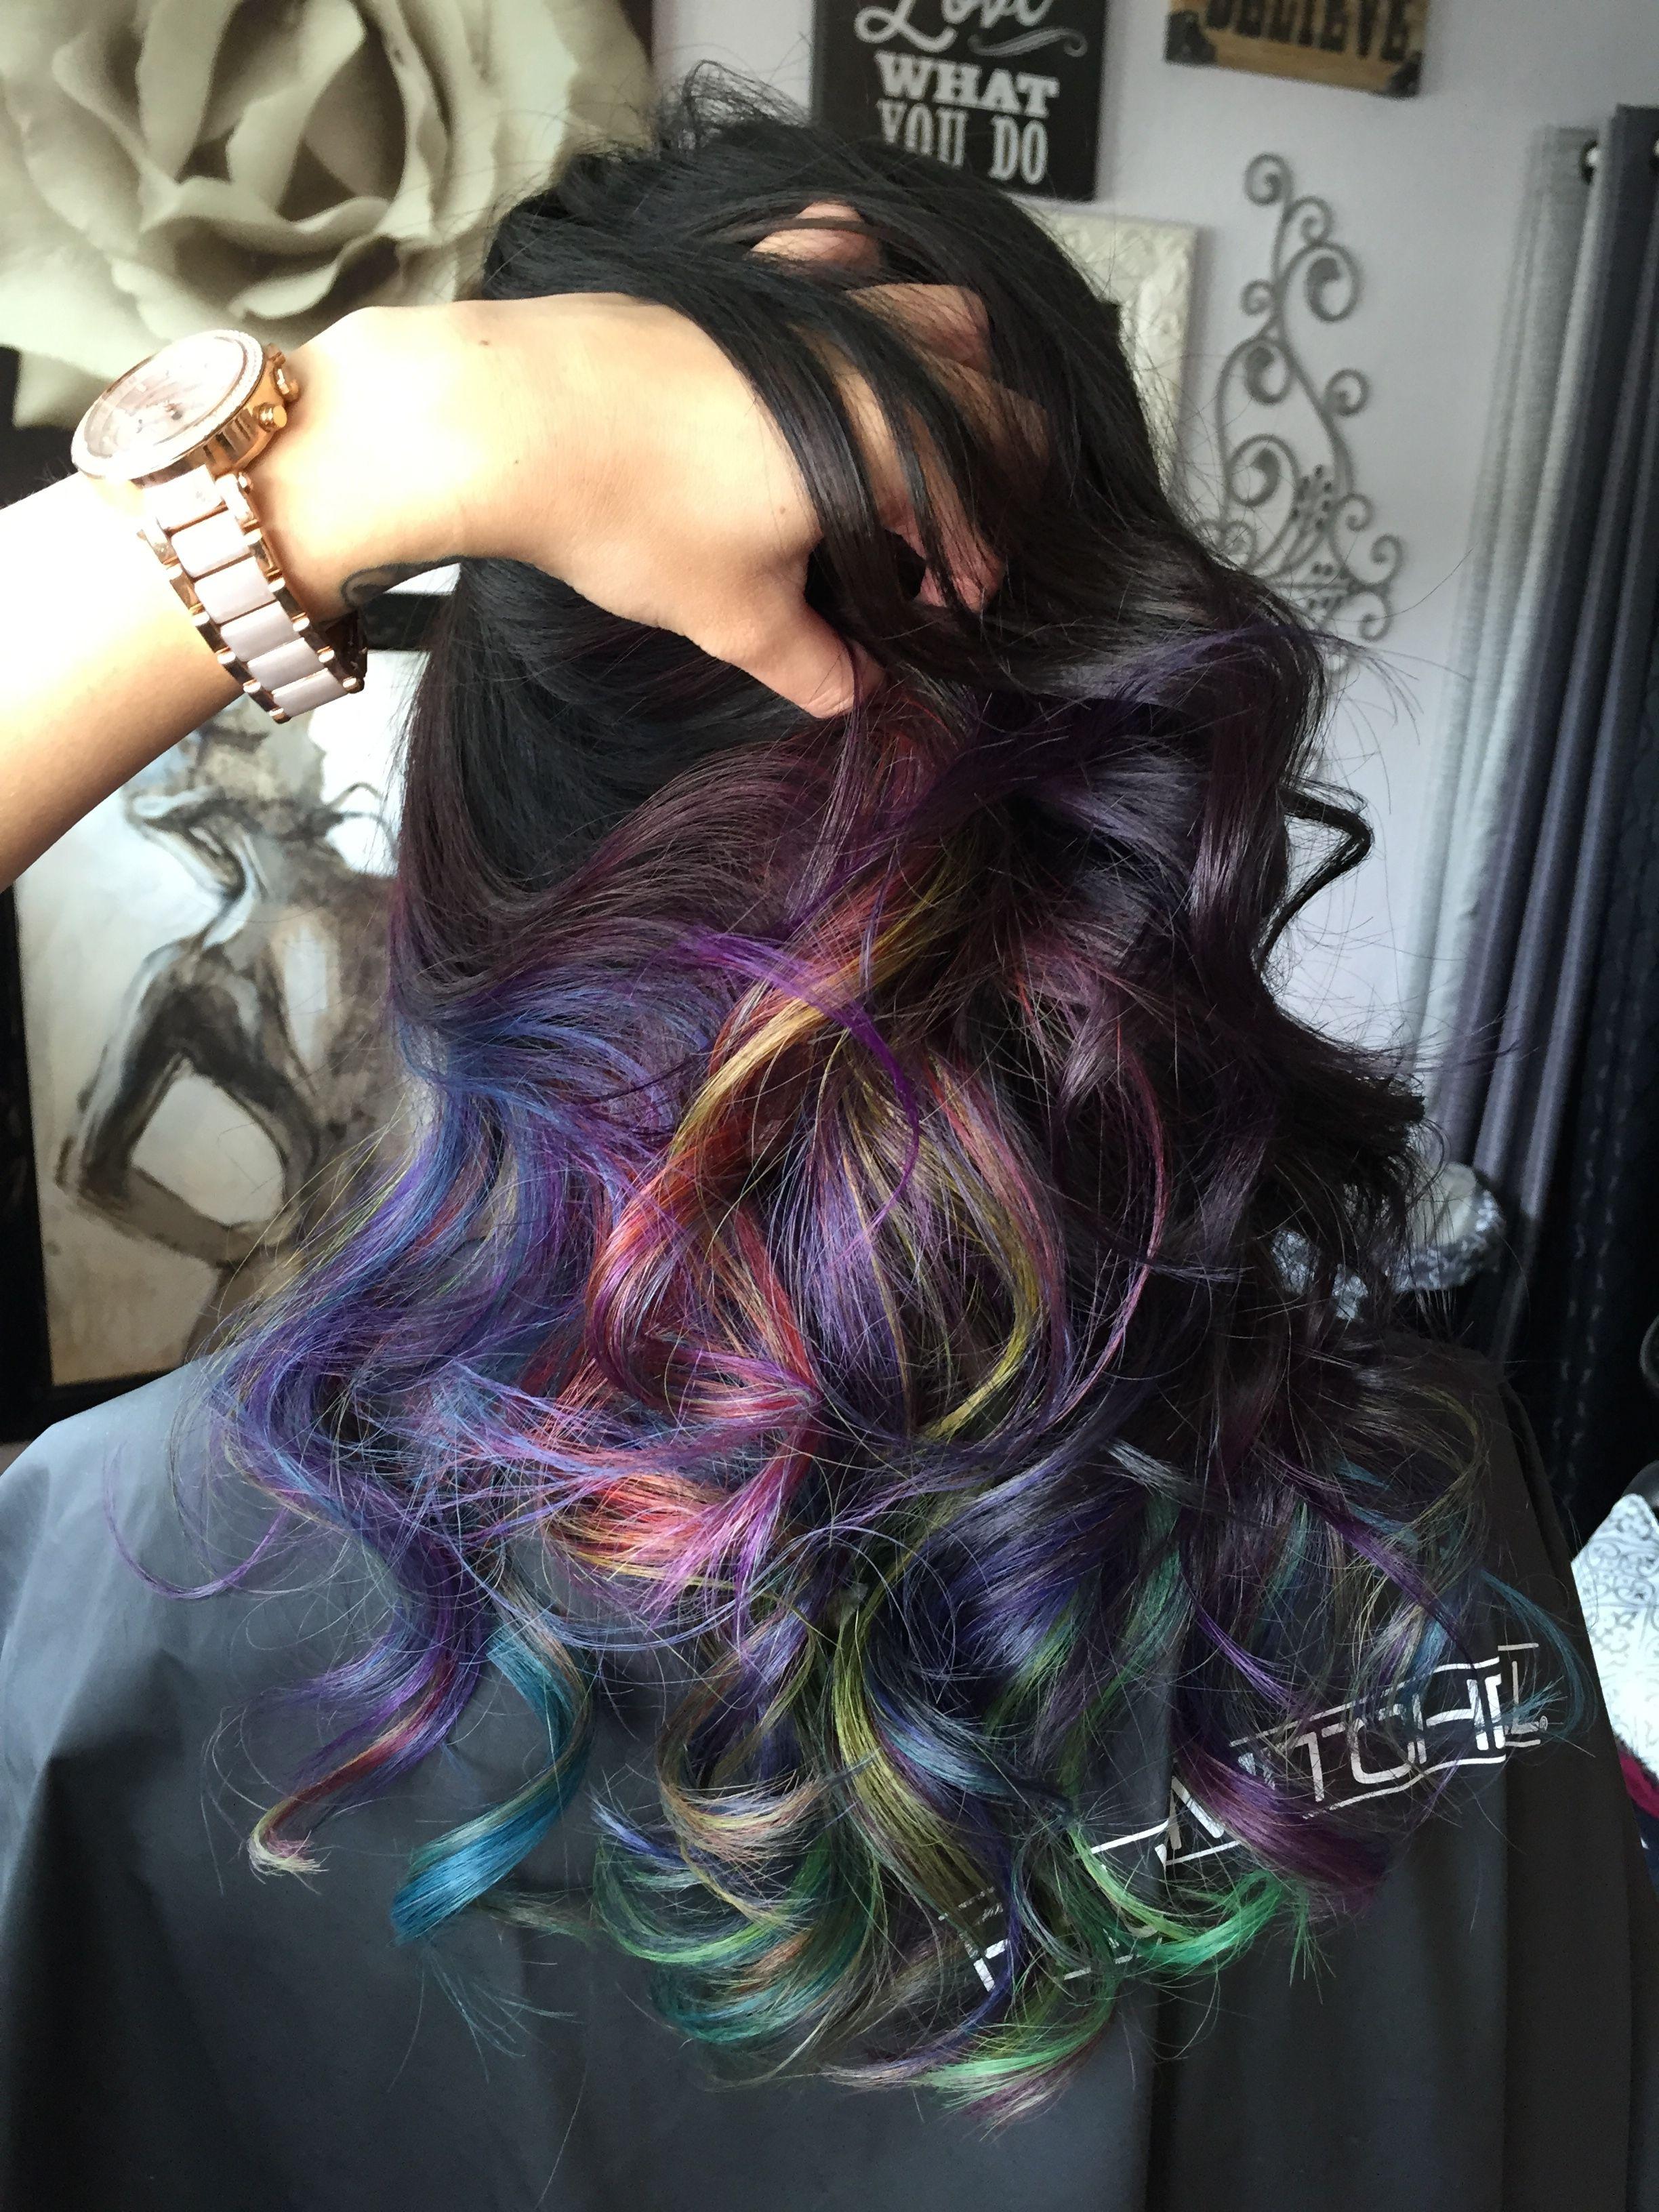 Sabre Salon Honolulu, HI (With images) Diy hairstyles